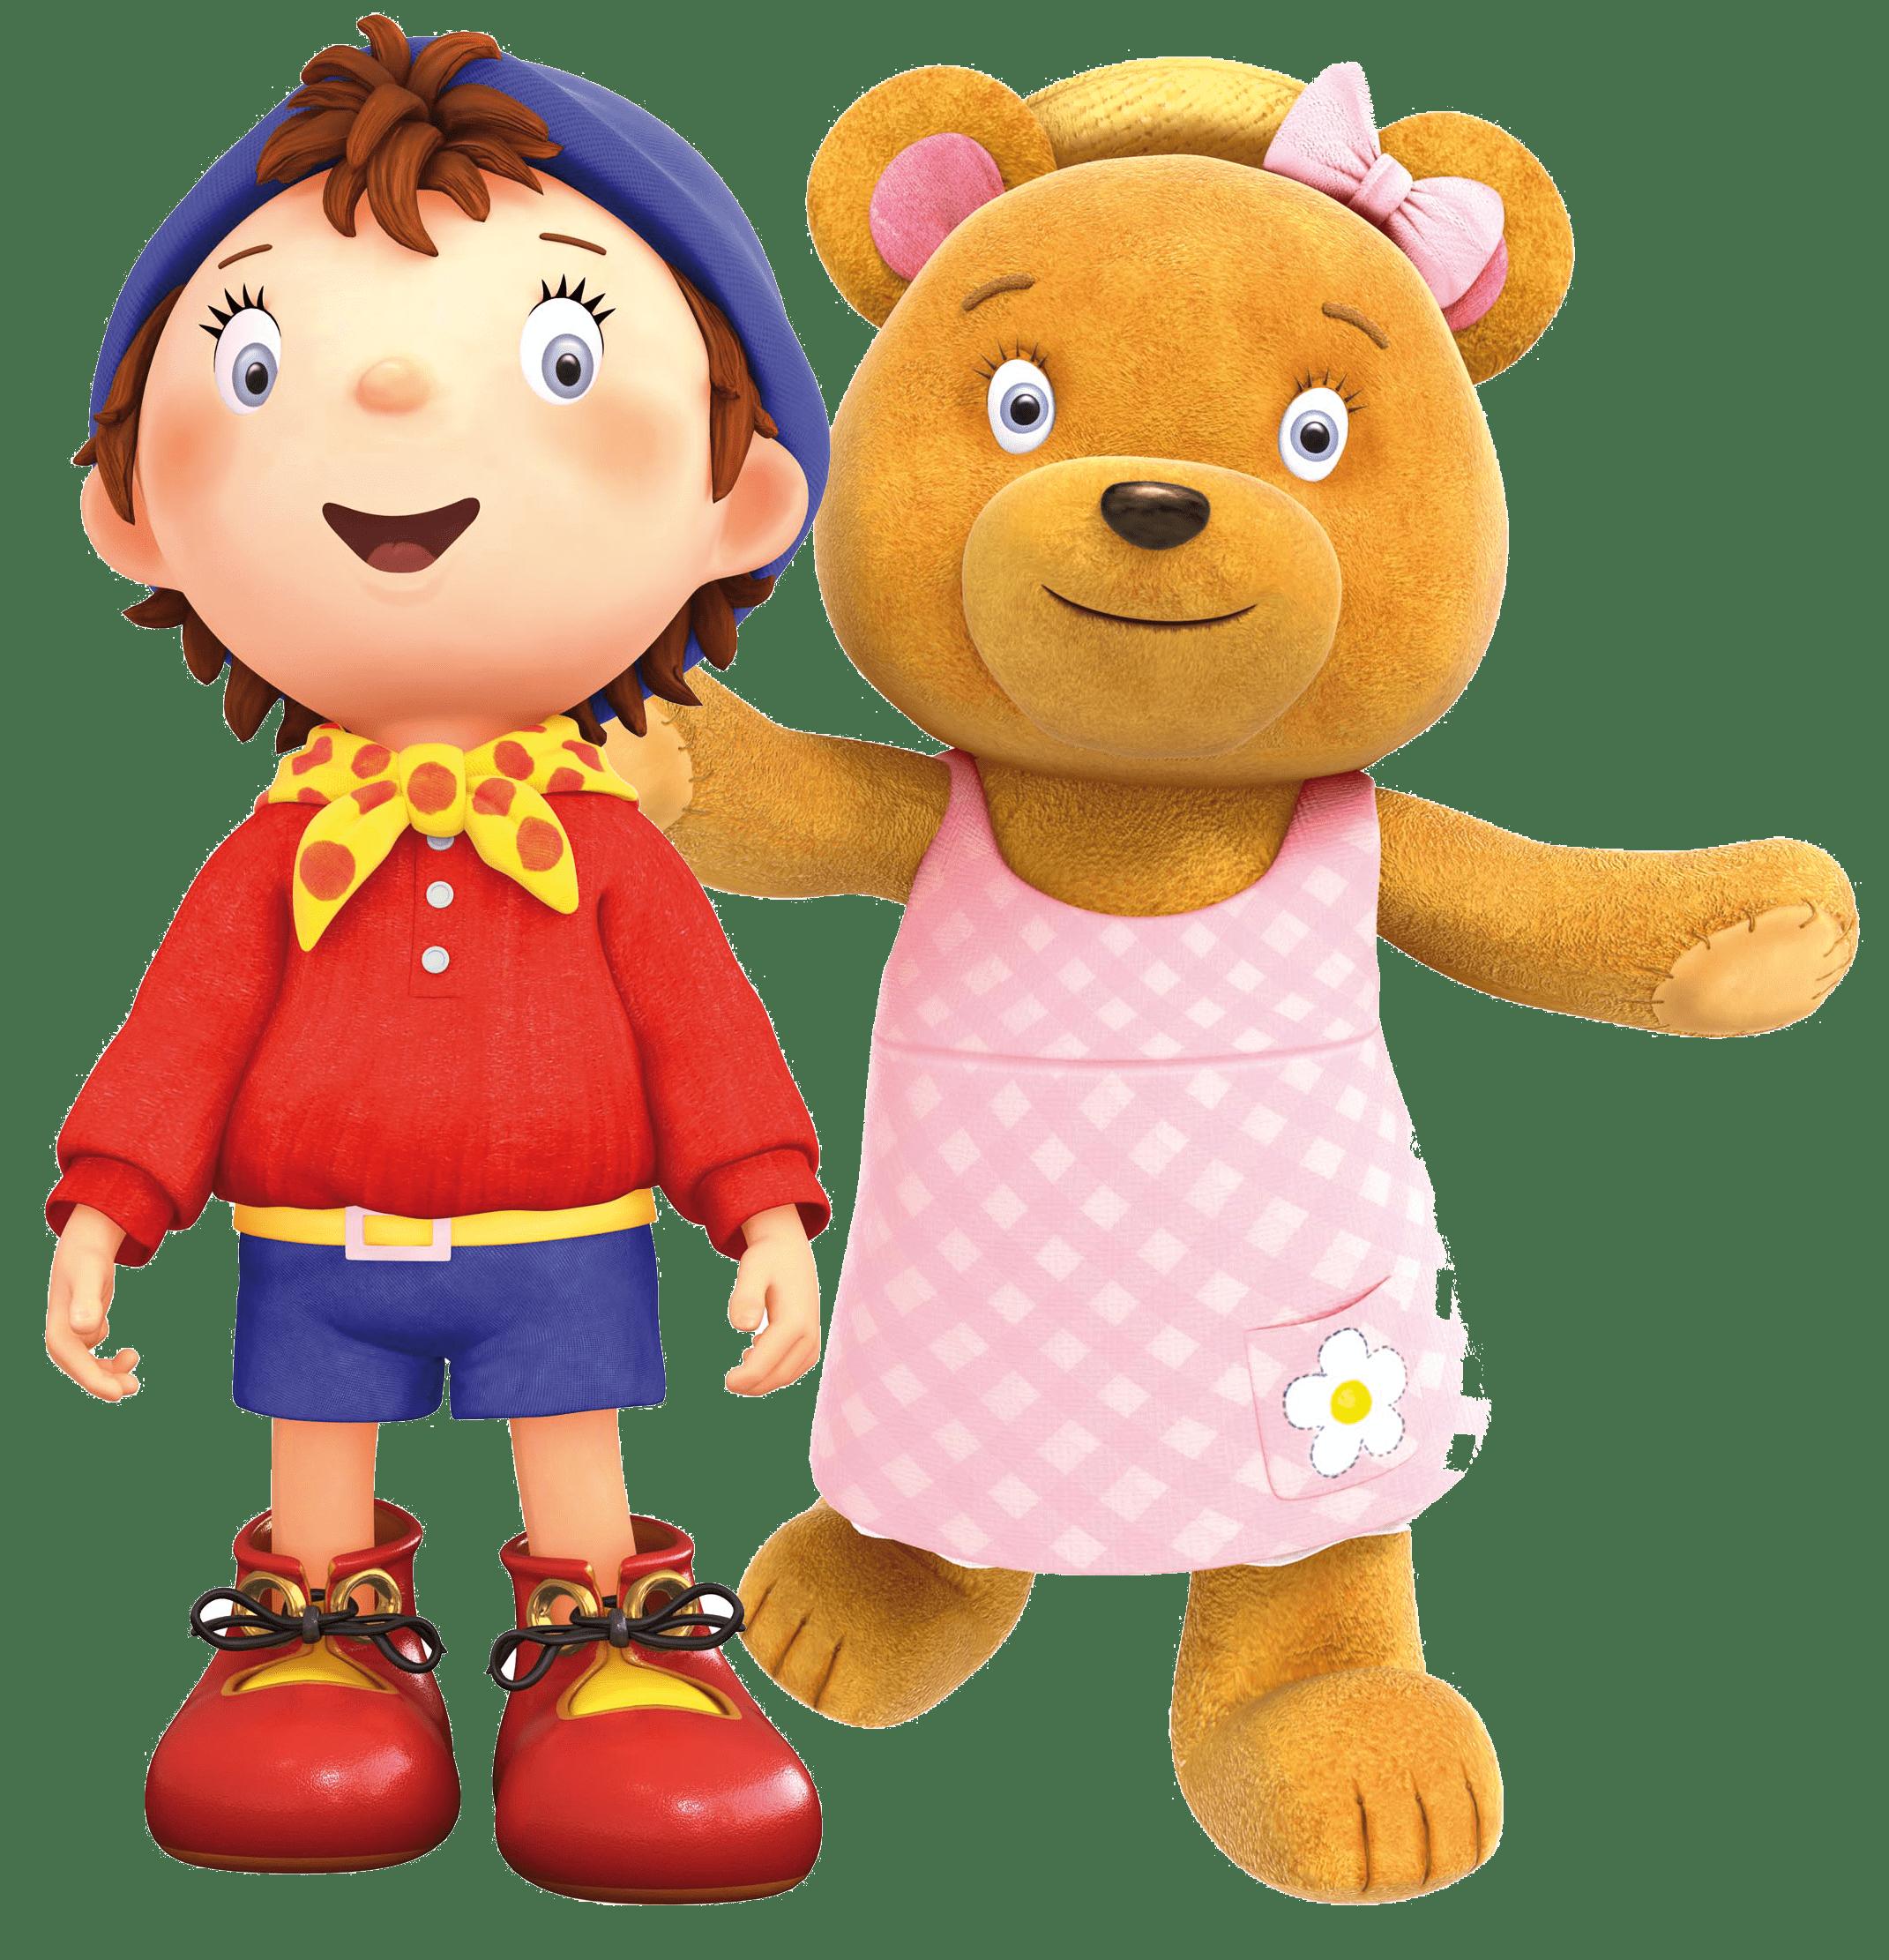 Noddy big ears gaumont animation cartoon children's parad png.